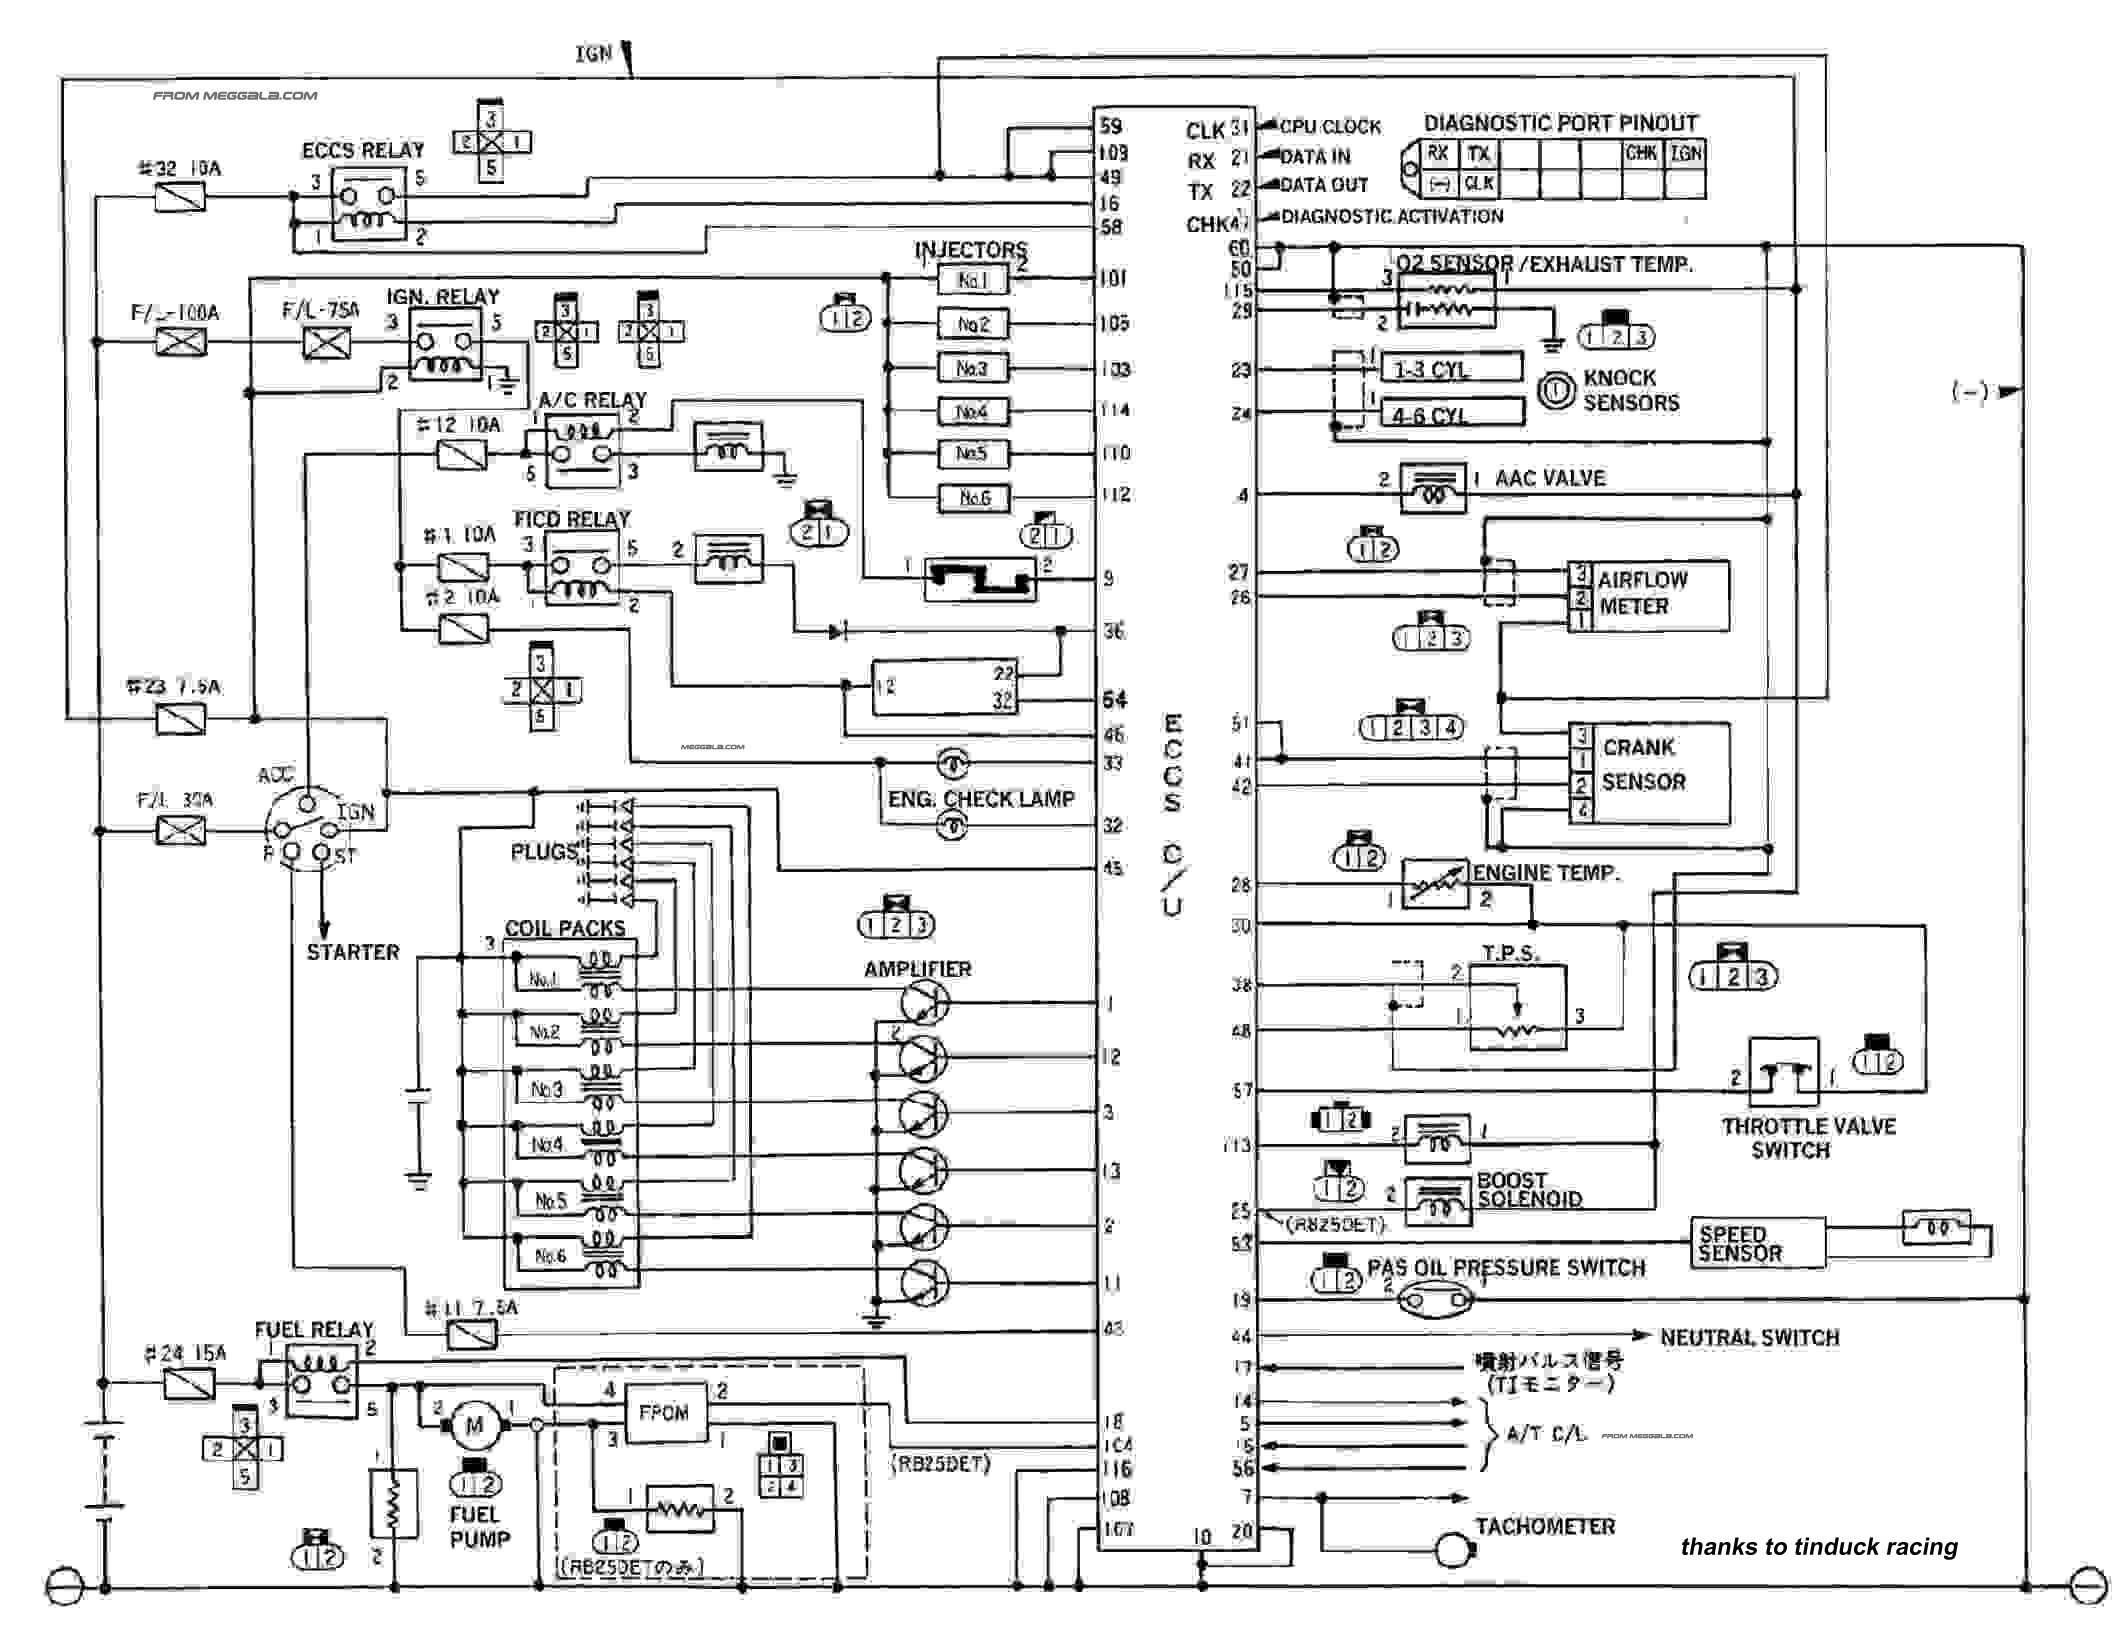 r33 wiring diagram example electrical wiring diagram \u2022 2003 Chevy S10 Fuel Pump Wiring Diagram at R33 Skyline Fuel Pump Wiring Diagram